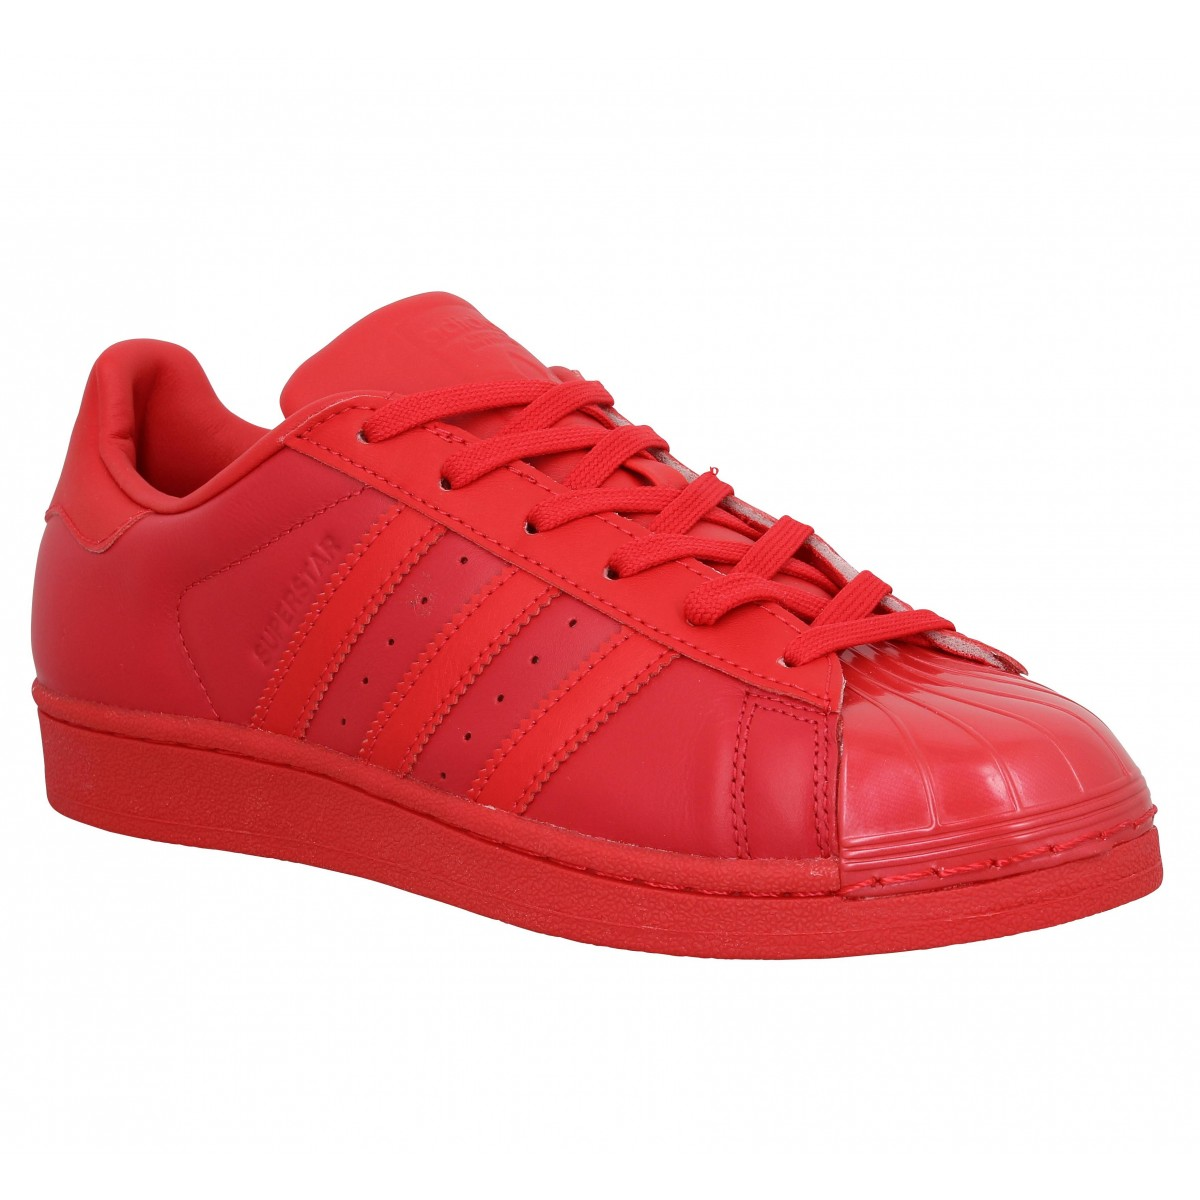 Adidas Femme Superstar-37 1/3-glossy...